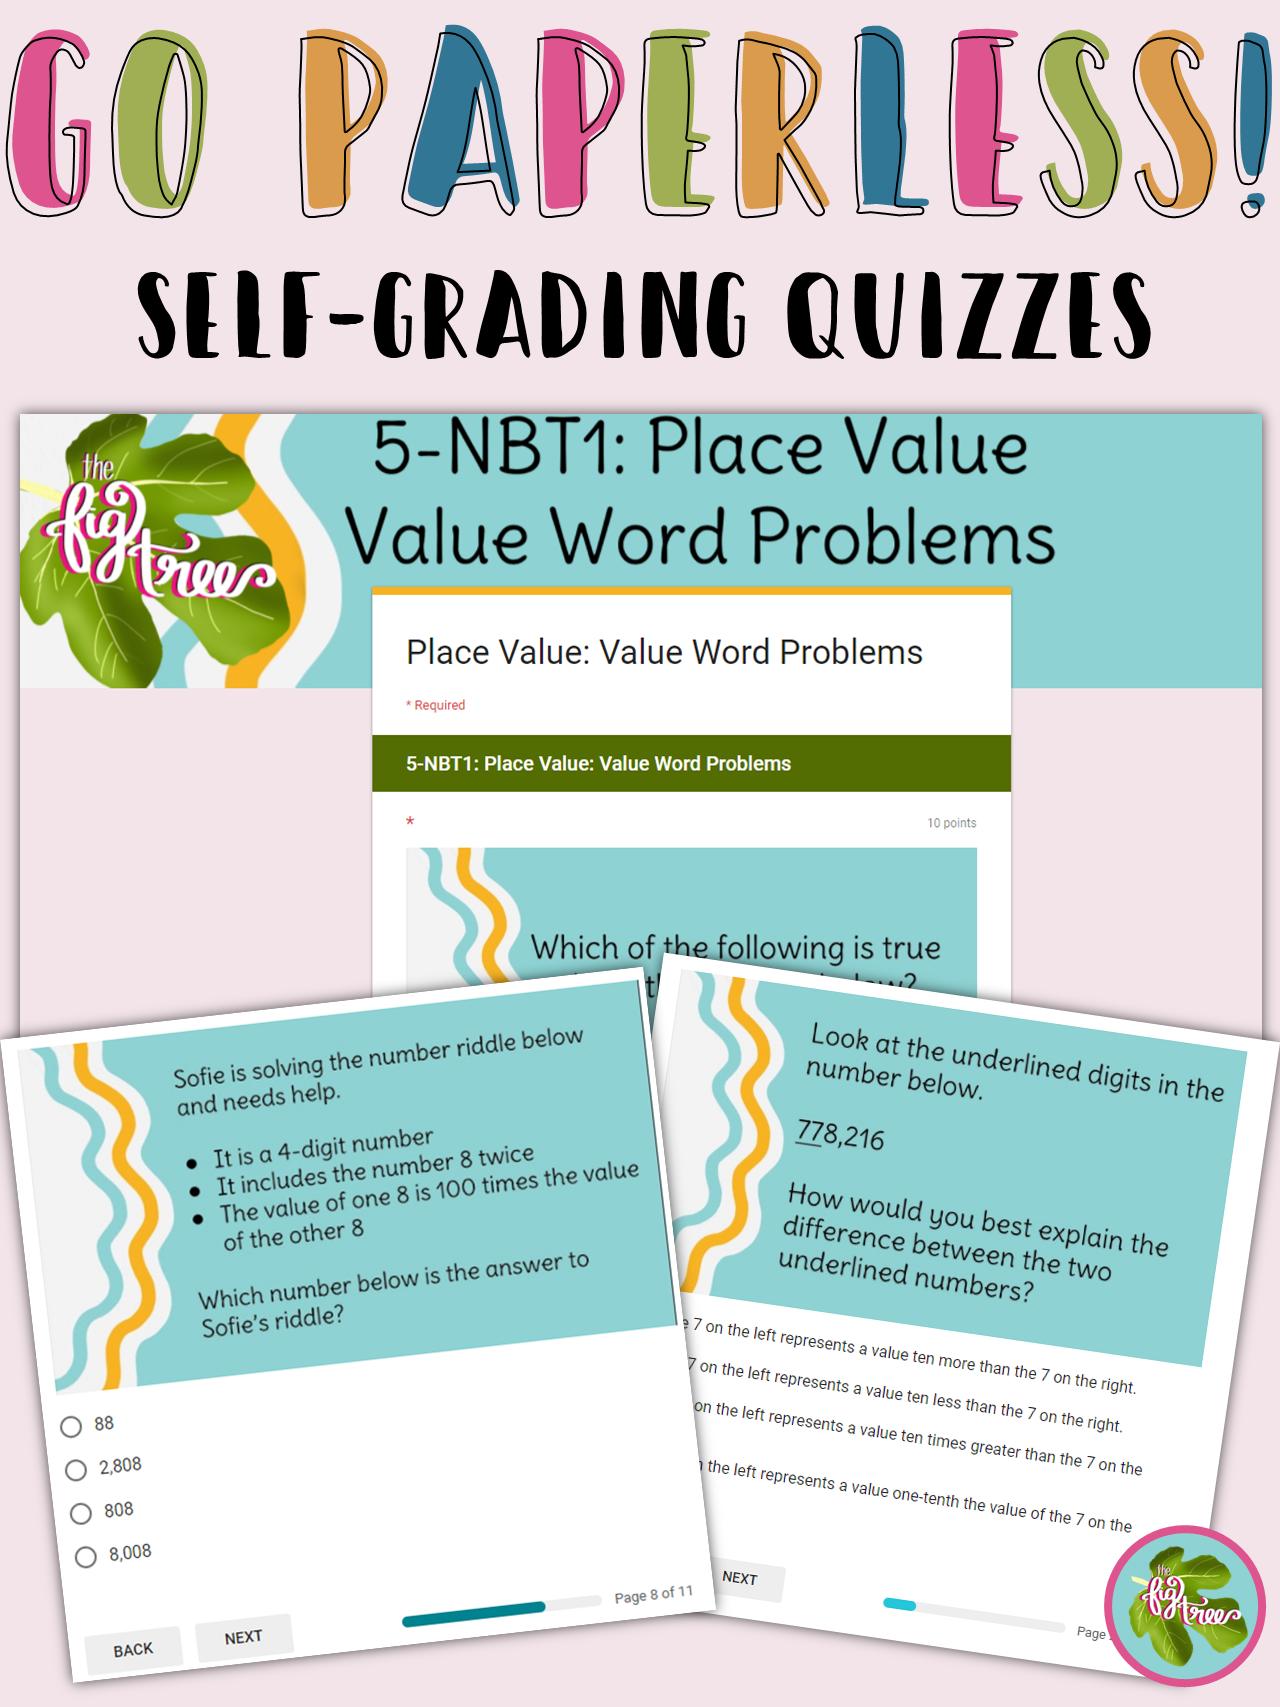 Place Value Word Problems Self Grading Quiz 5 Nbt1